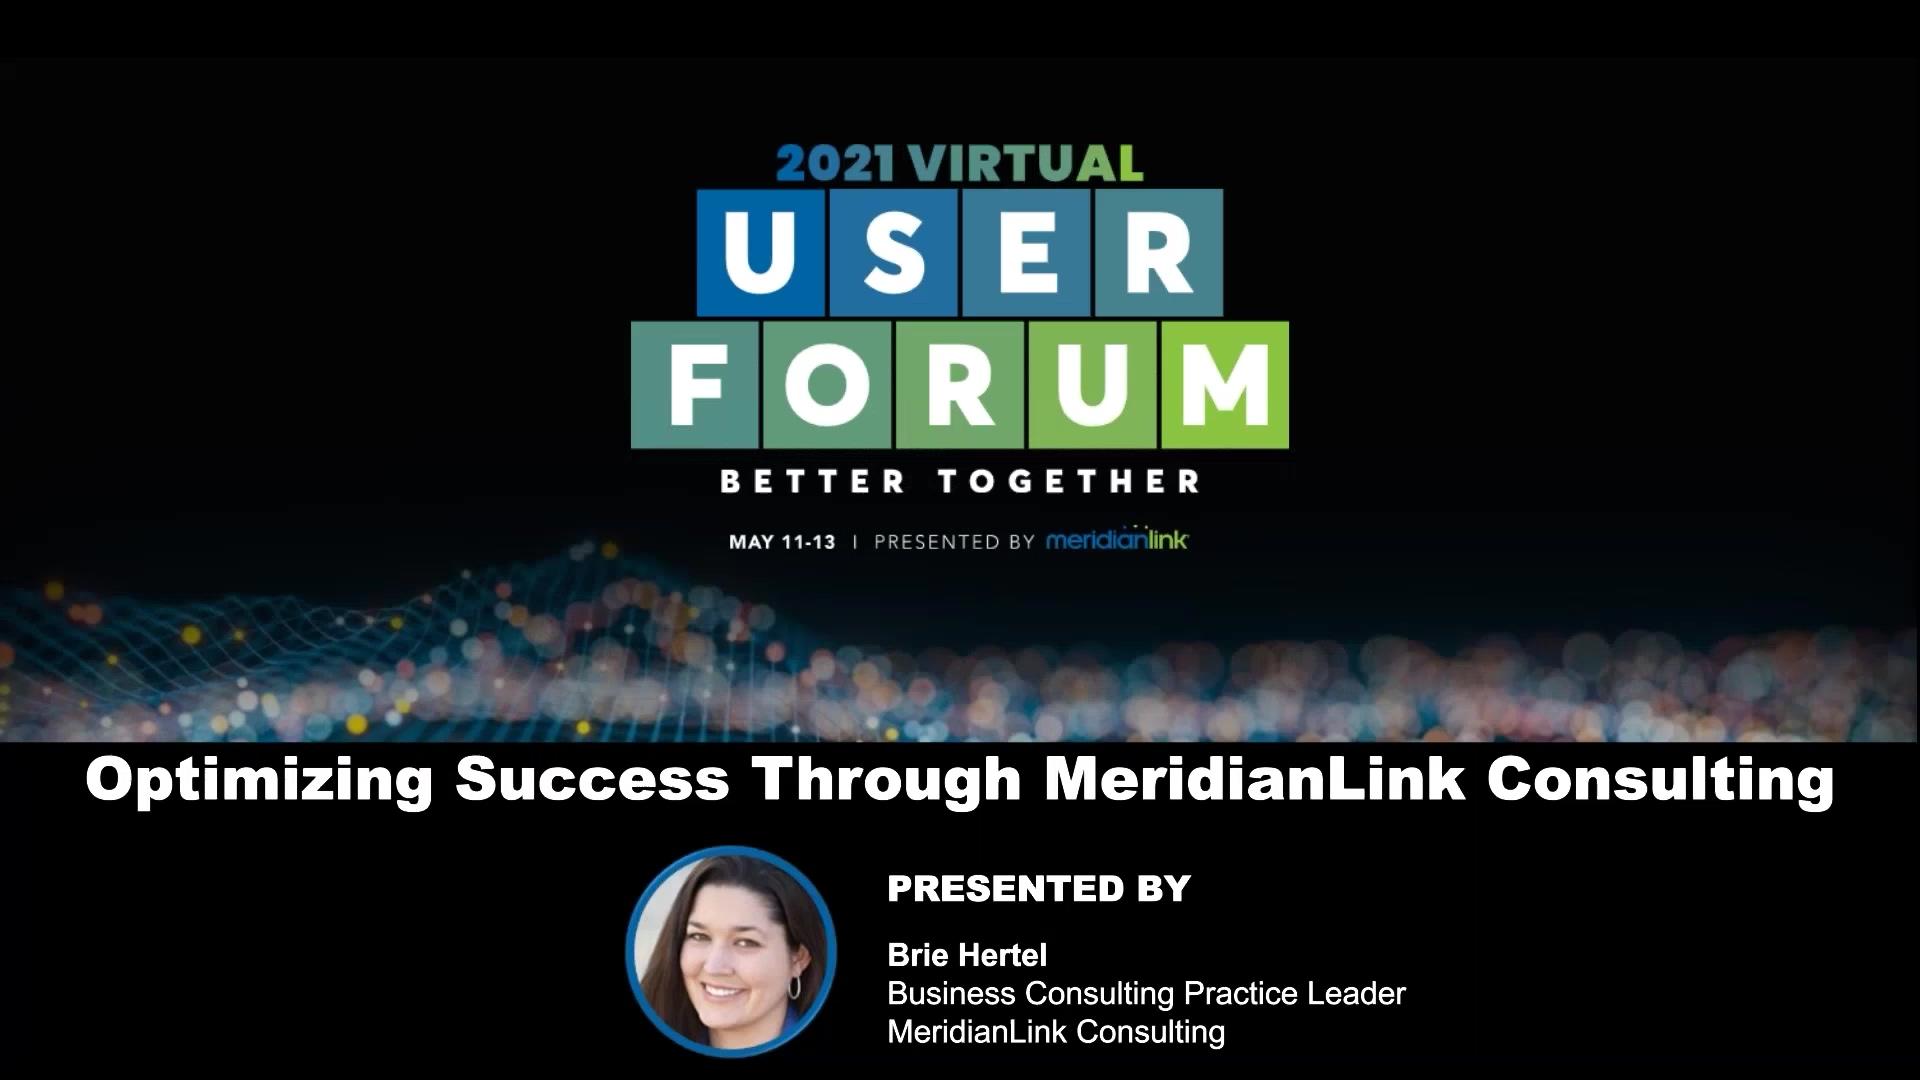 Optimizing Success through MeridianLink Consulting